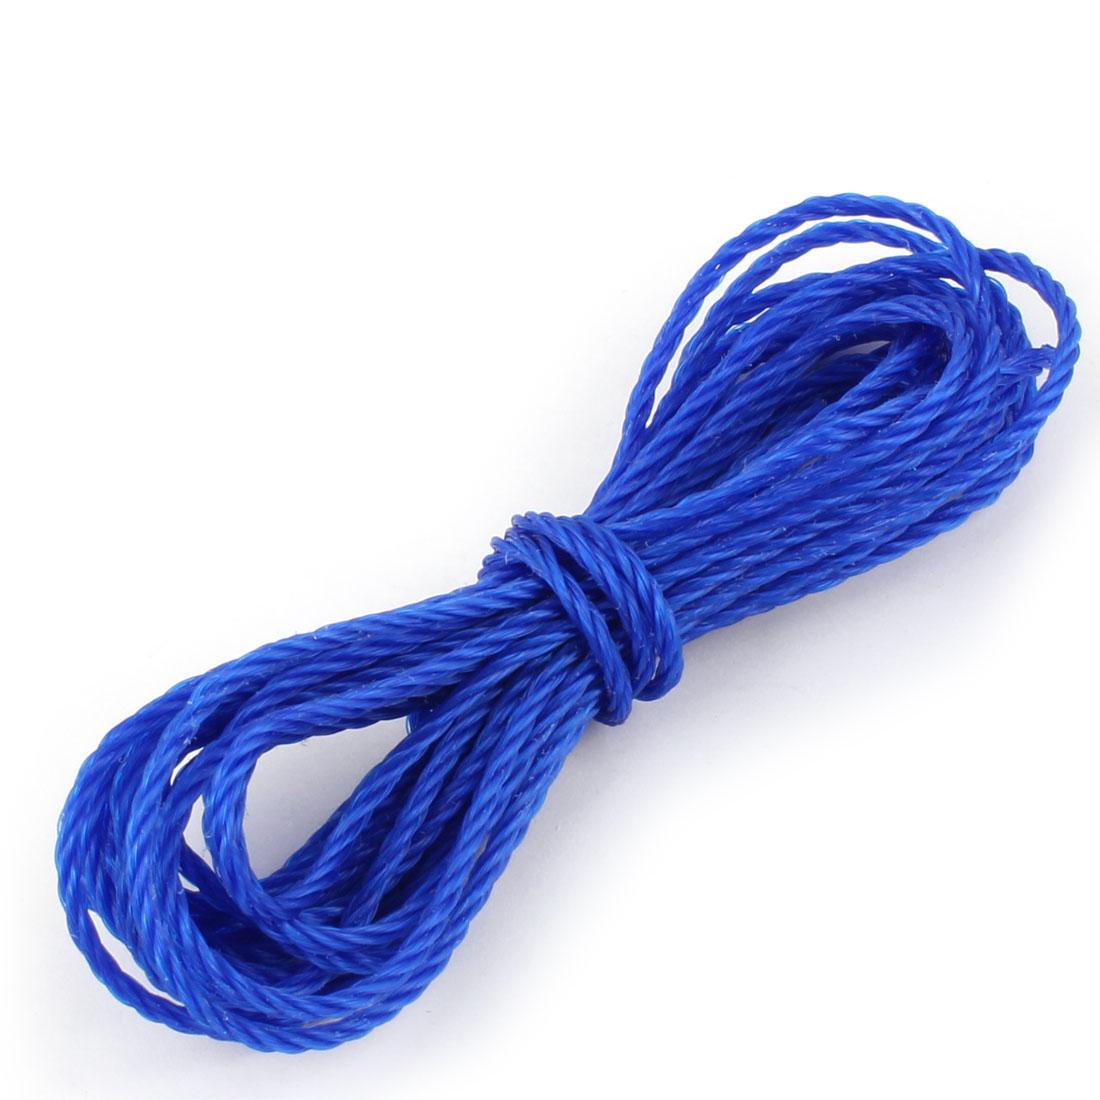 Household Outdoor Nylon String Clothes Line Clothesline Dark Blue 5m Length